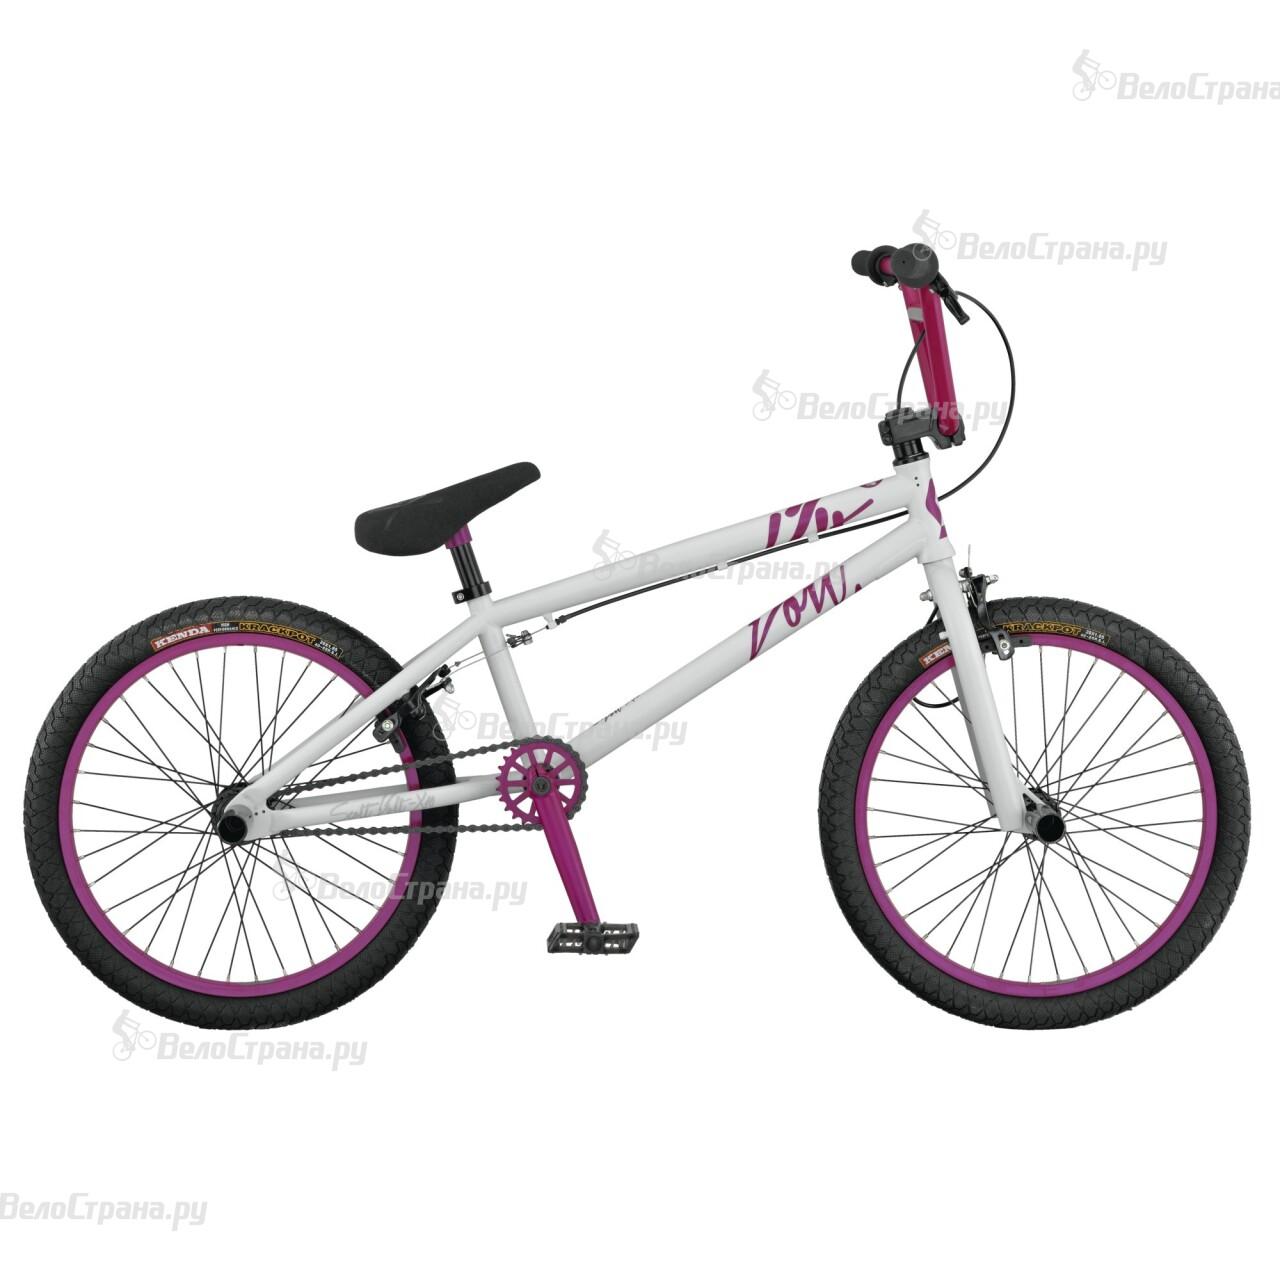 Велосипед Scott Volt-X 10 (2015) маяк findme f2 volt